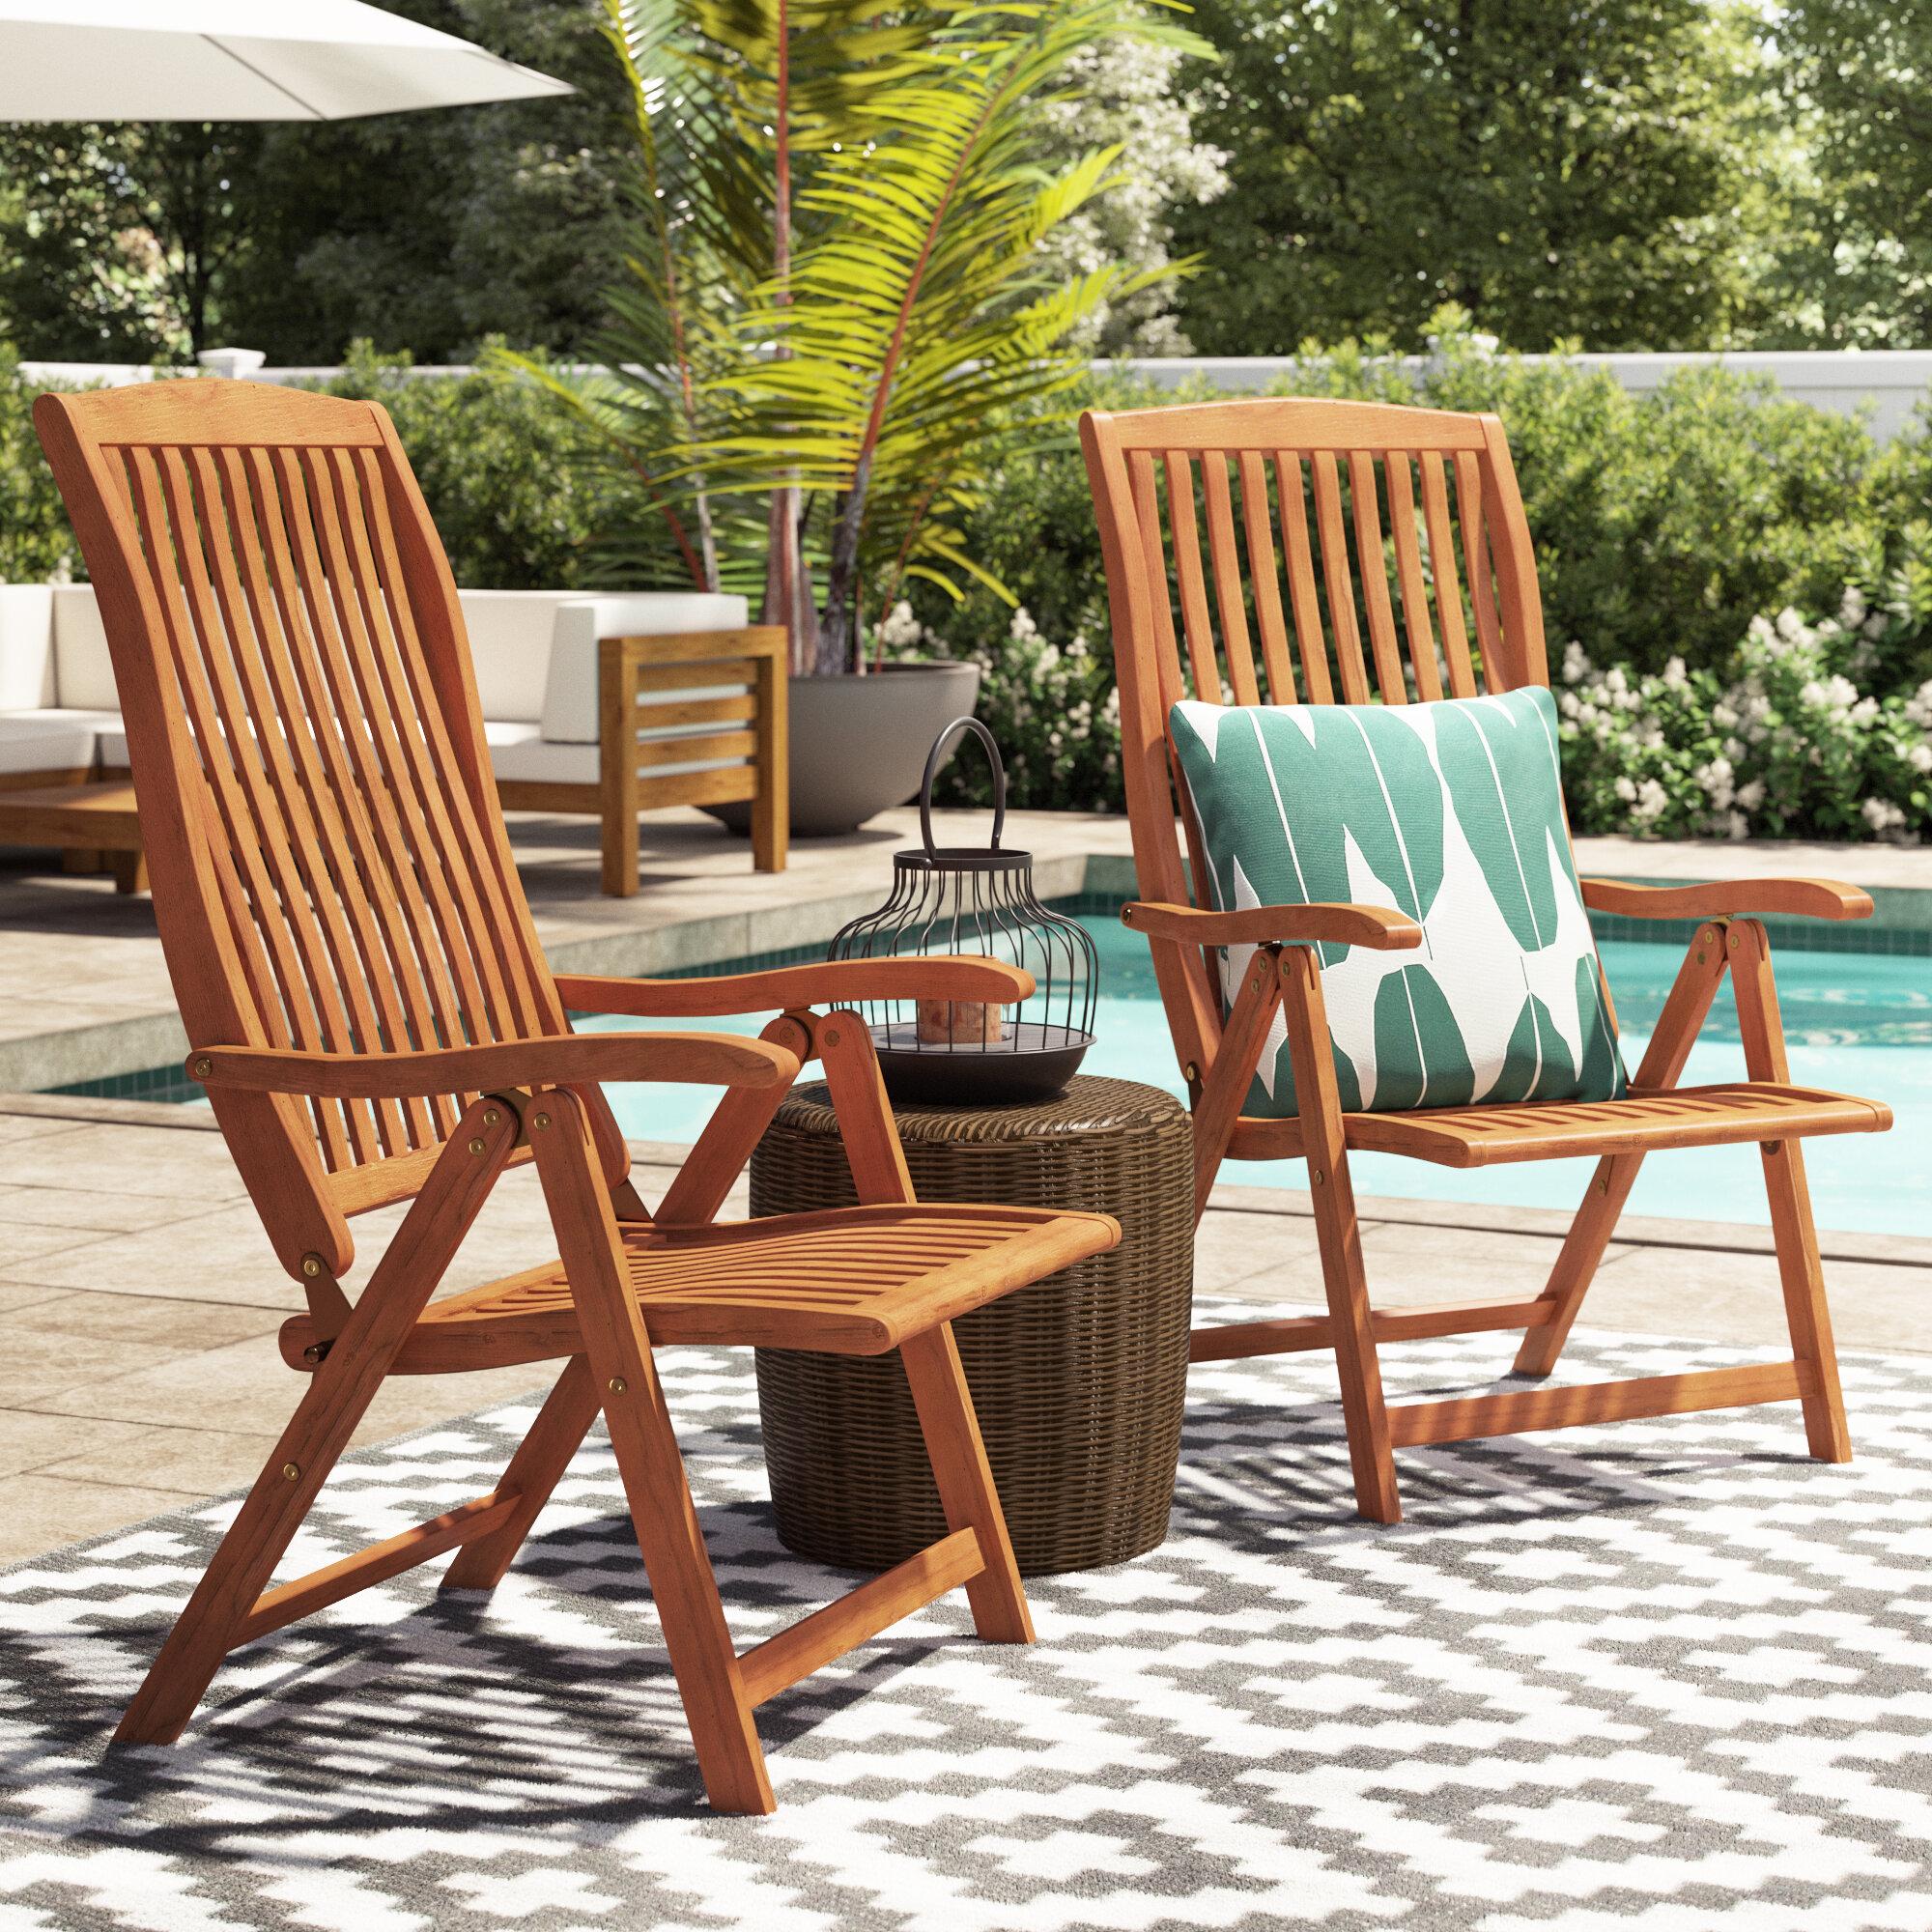 Astonishing Sun Flair Folding Garden Chair Ncnpc Chair Design For Home Ncnpcorg